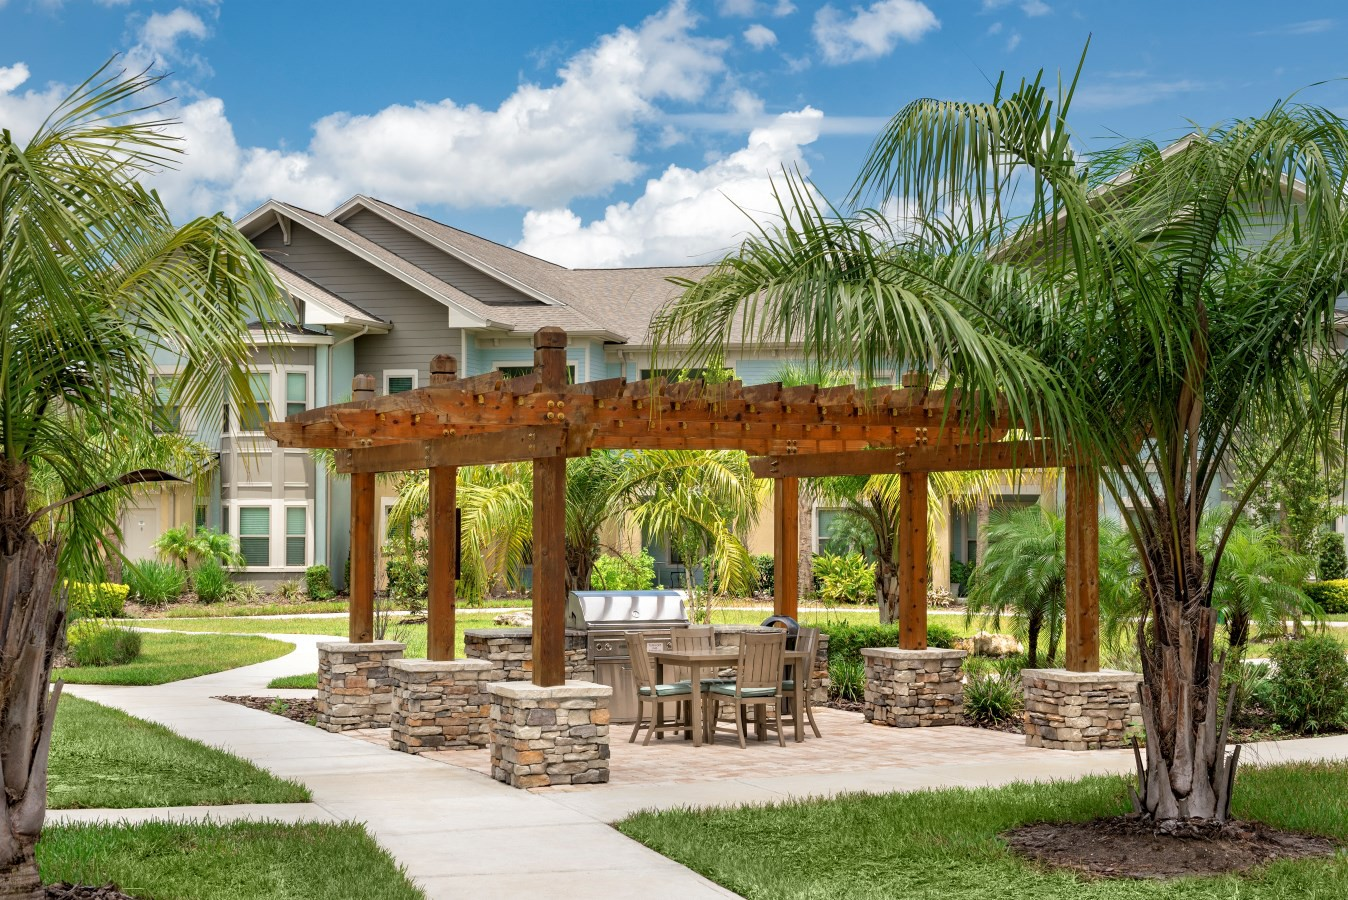 Luxe Lakewood Ranch, Sarasota-bradenton - (see pics & AVAIL)